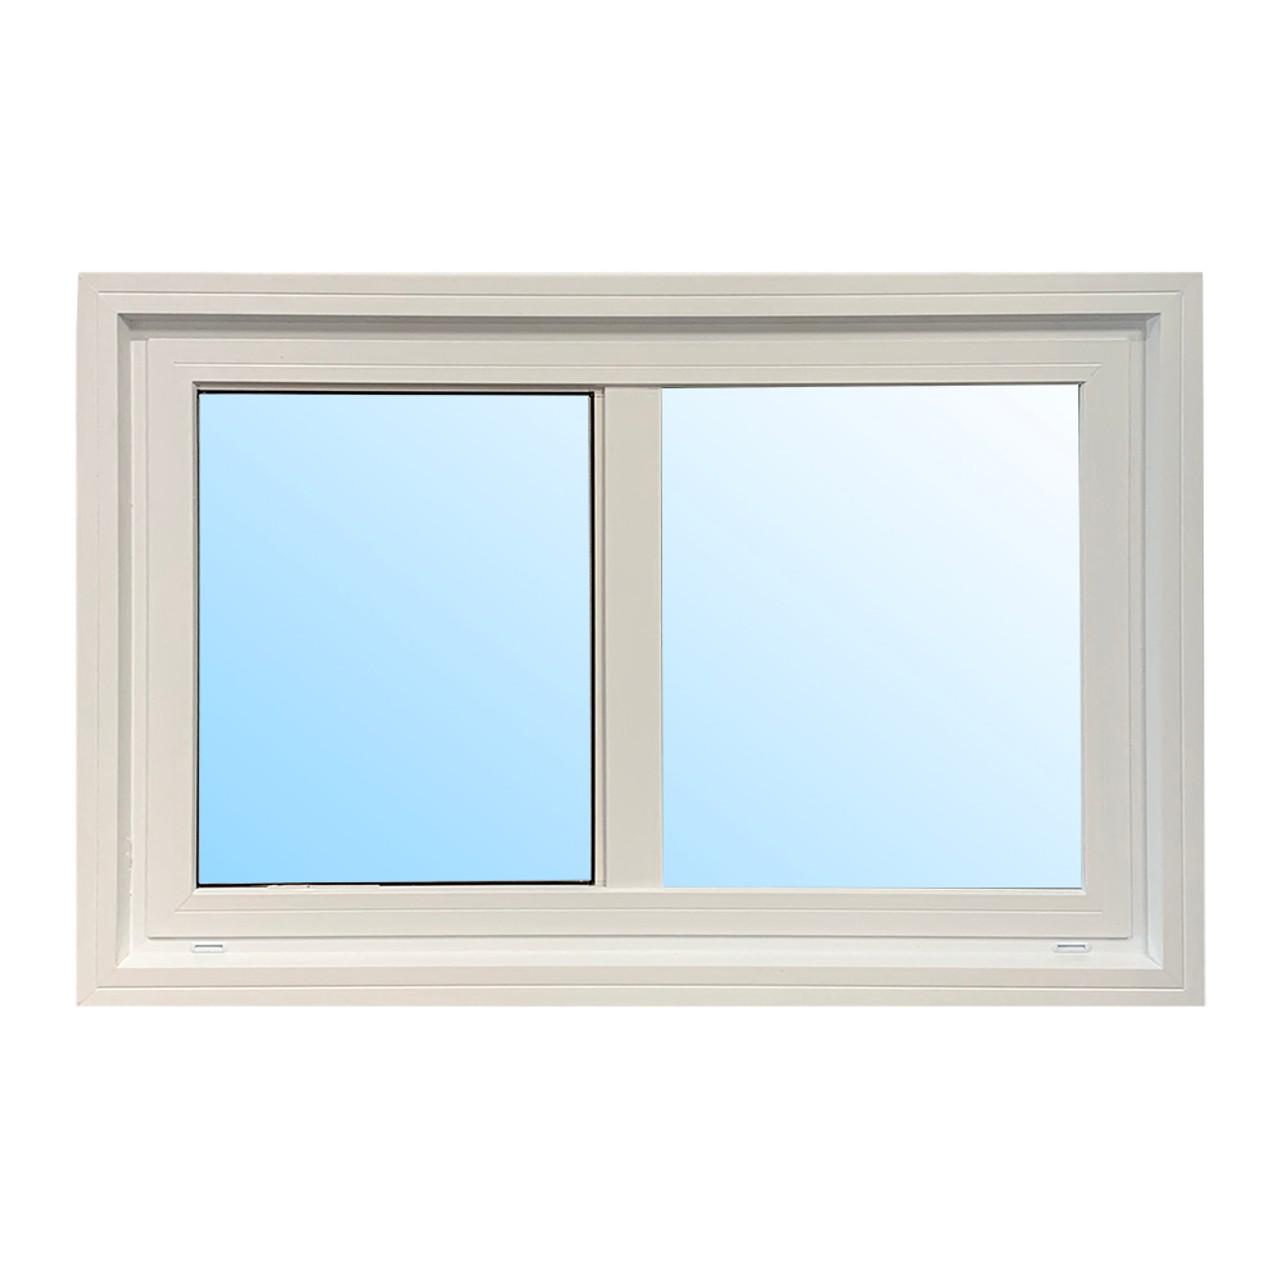 "Castlegard | 36"" x 35"" Horizontal Slider Window | LEA"